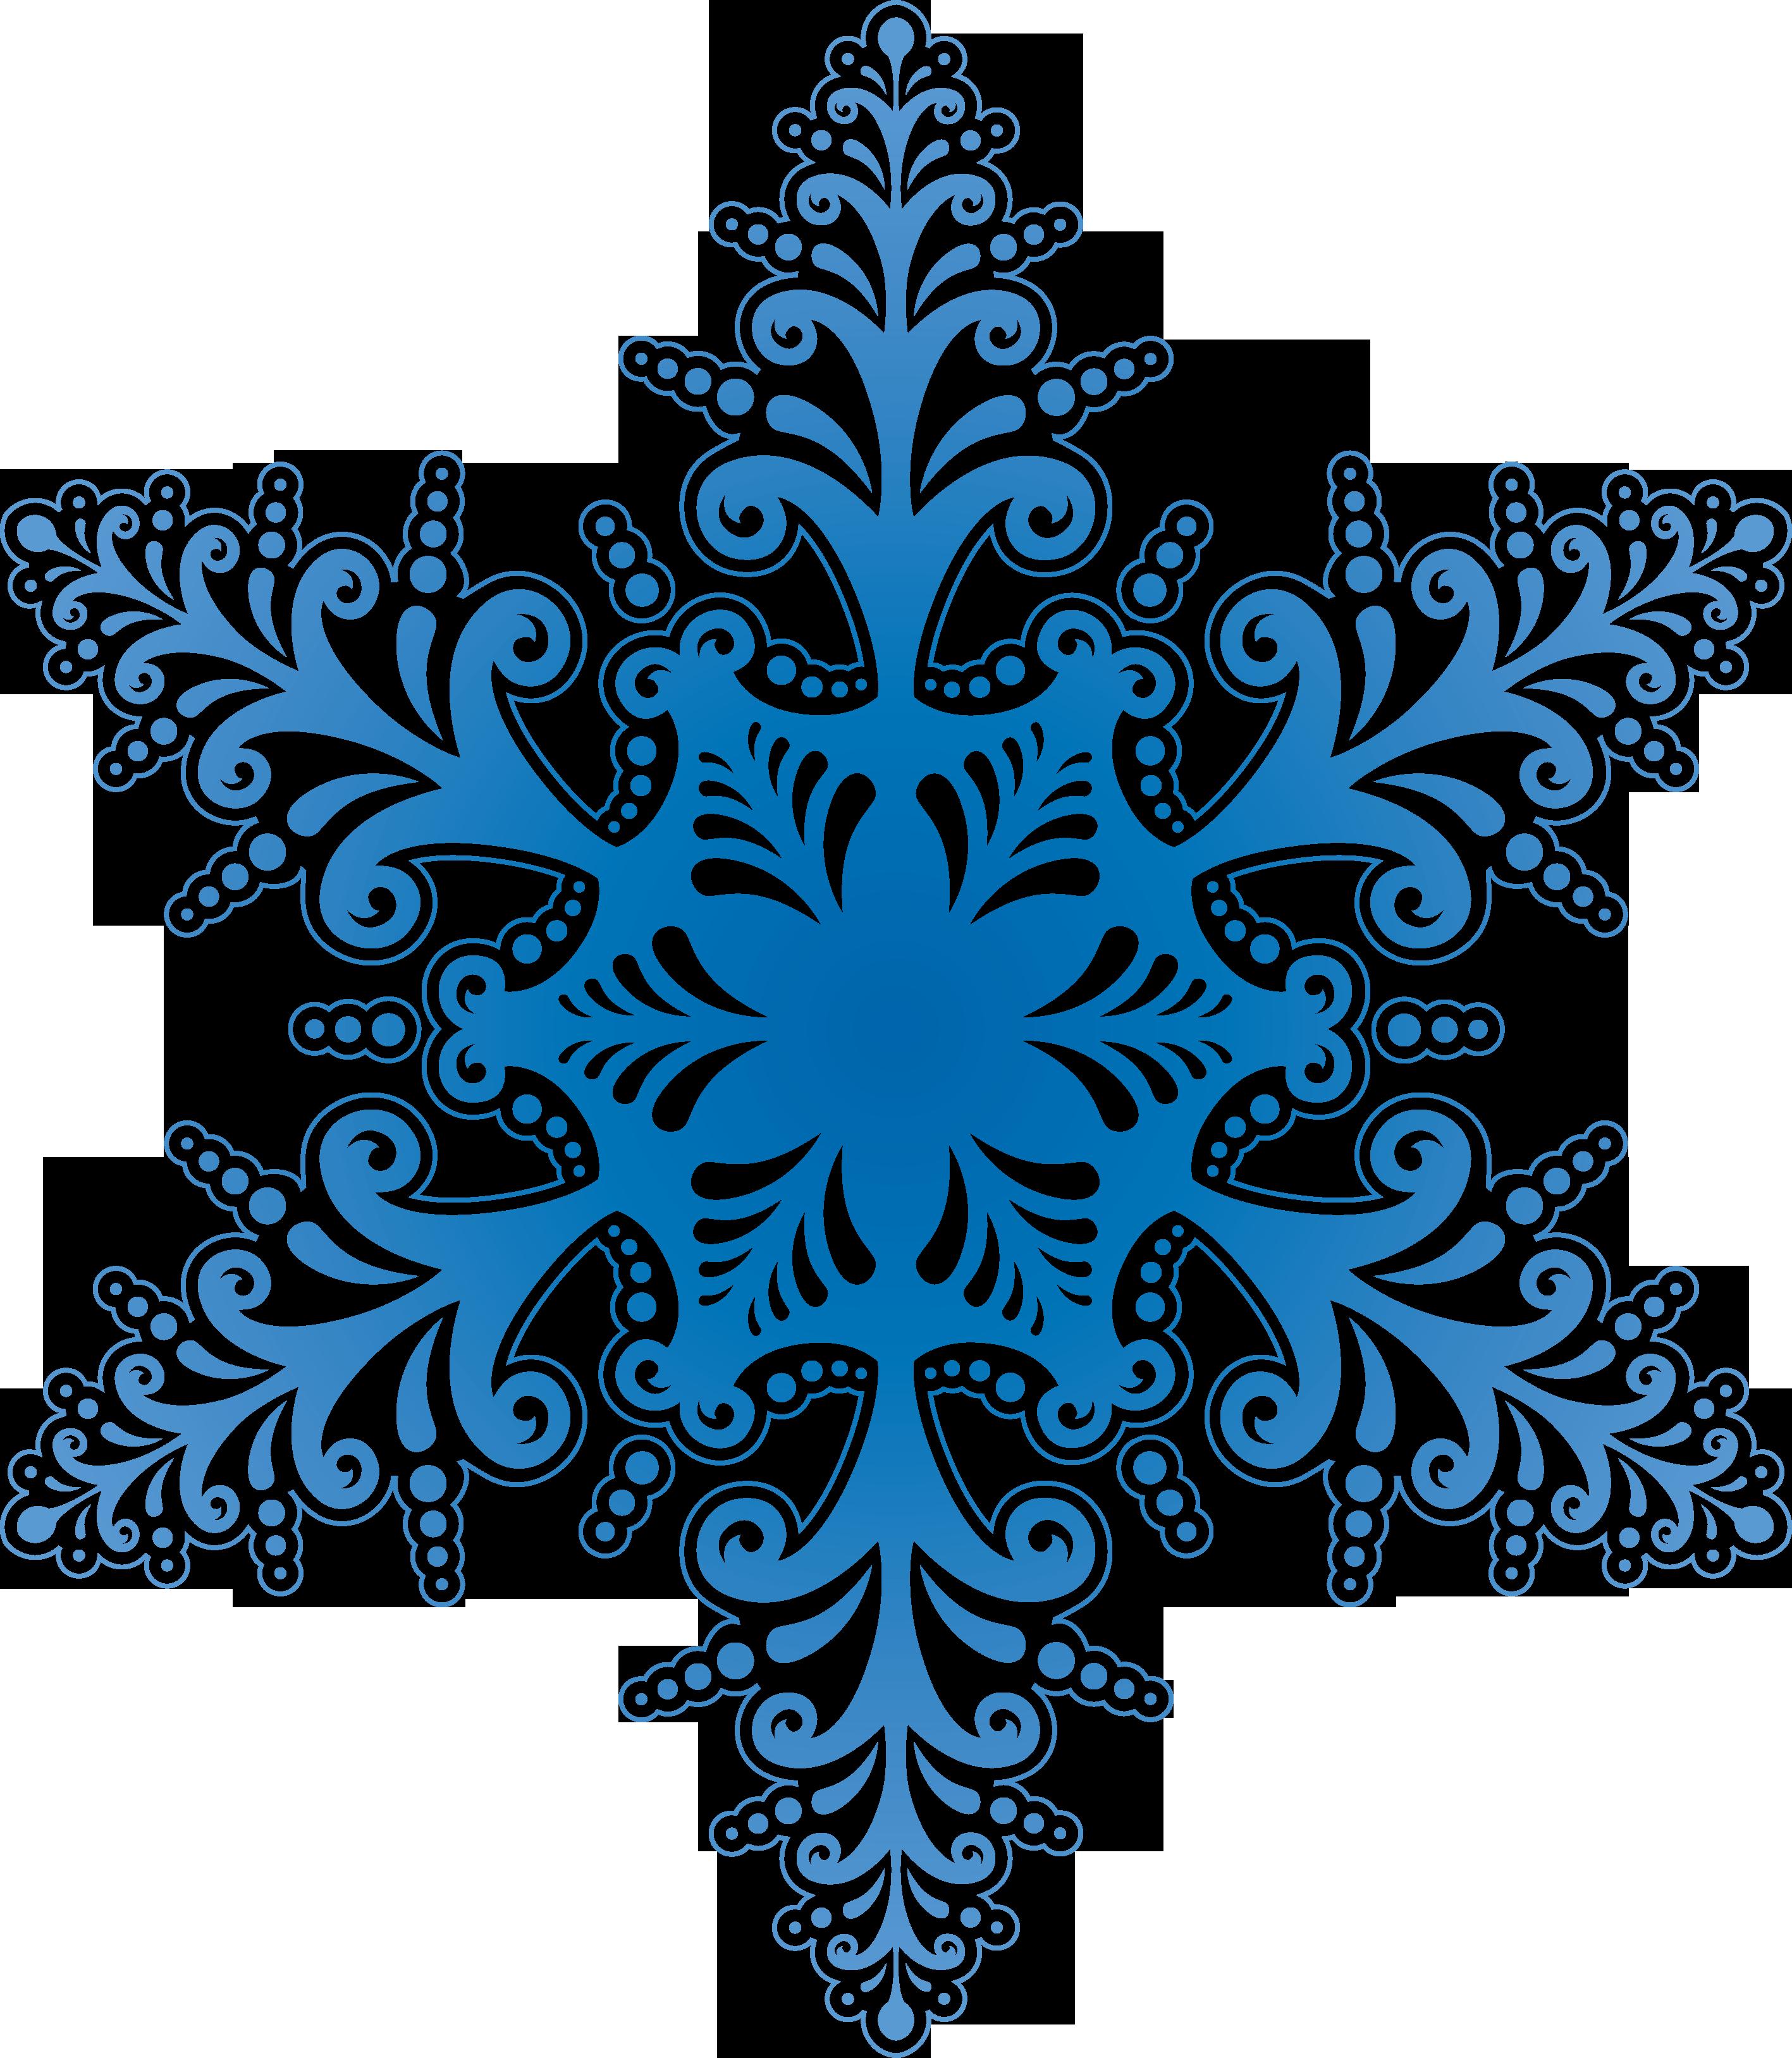 Blue Winter Snowflake PNG Image